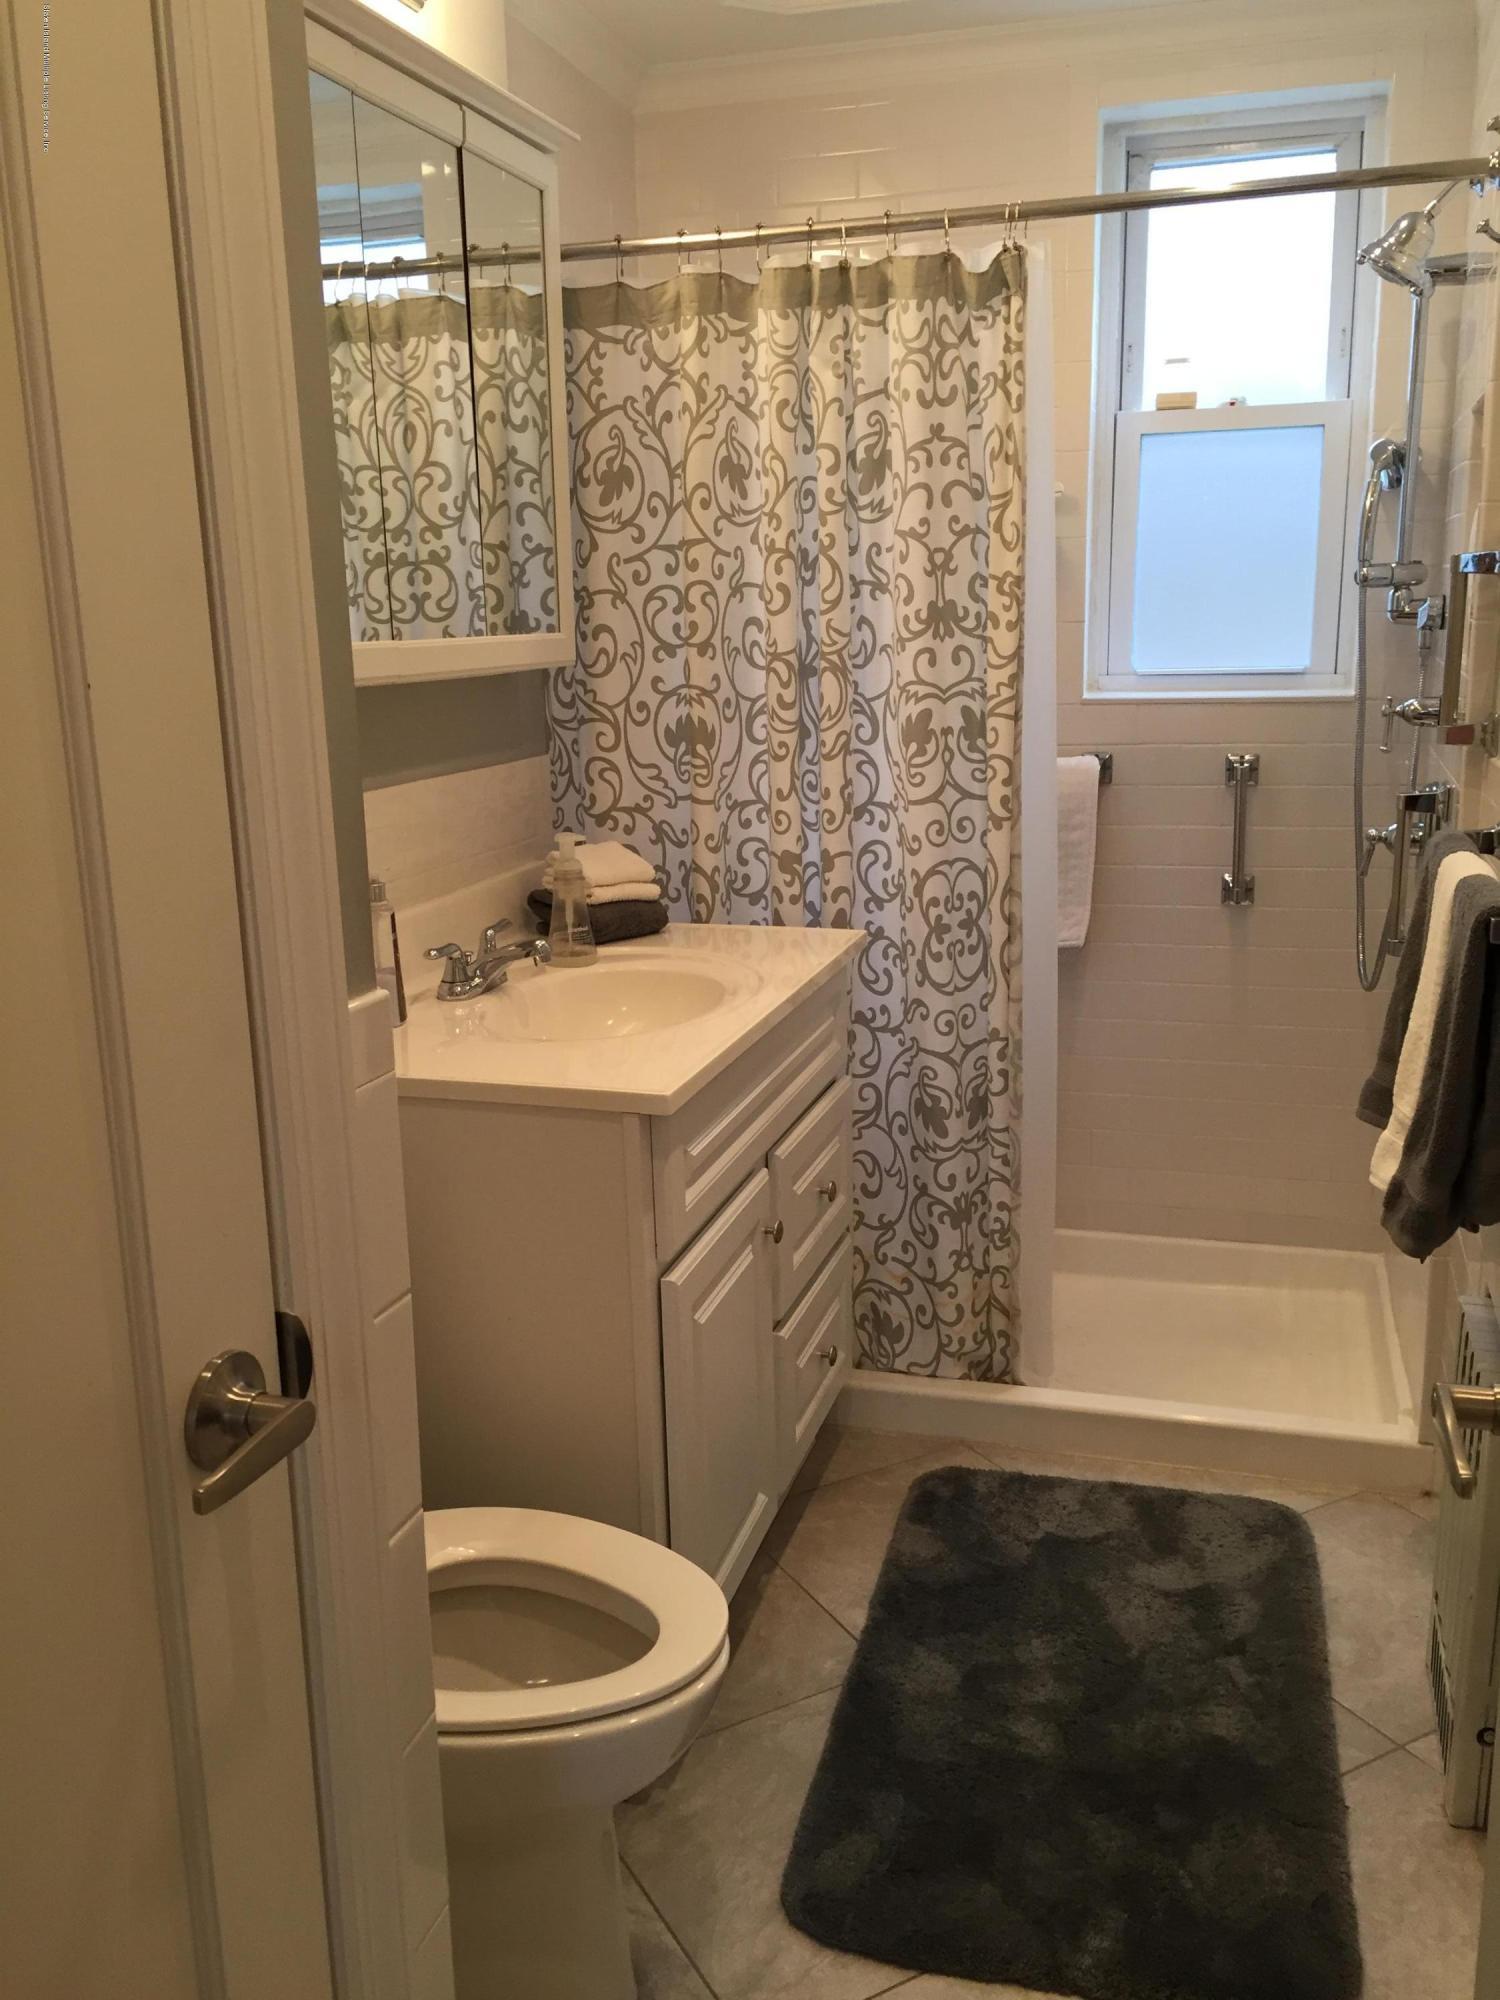 Two Family - Semi-Attached 31 Coale Avenue  Staten Island, NY 10314, MLS-1123386-8